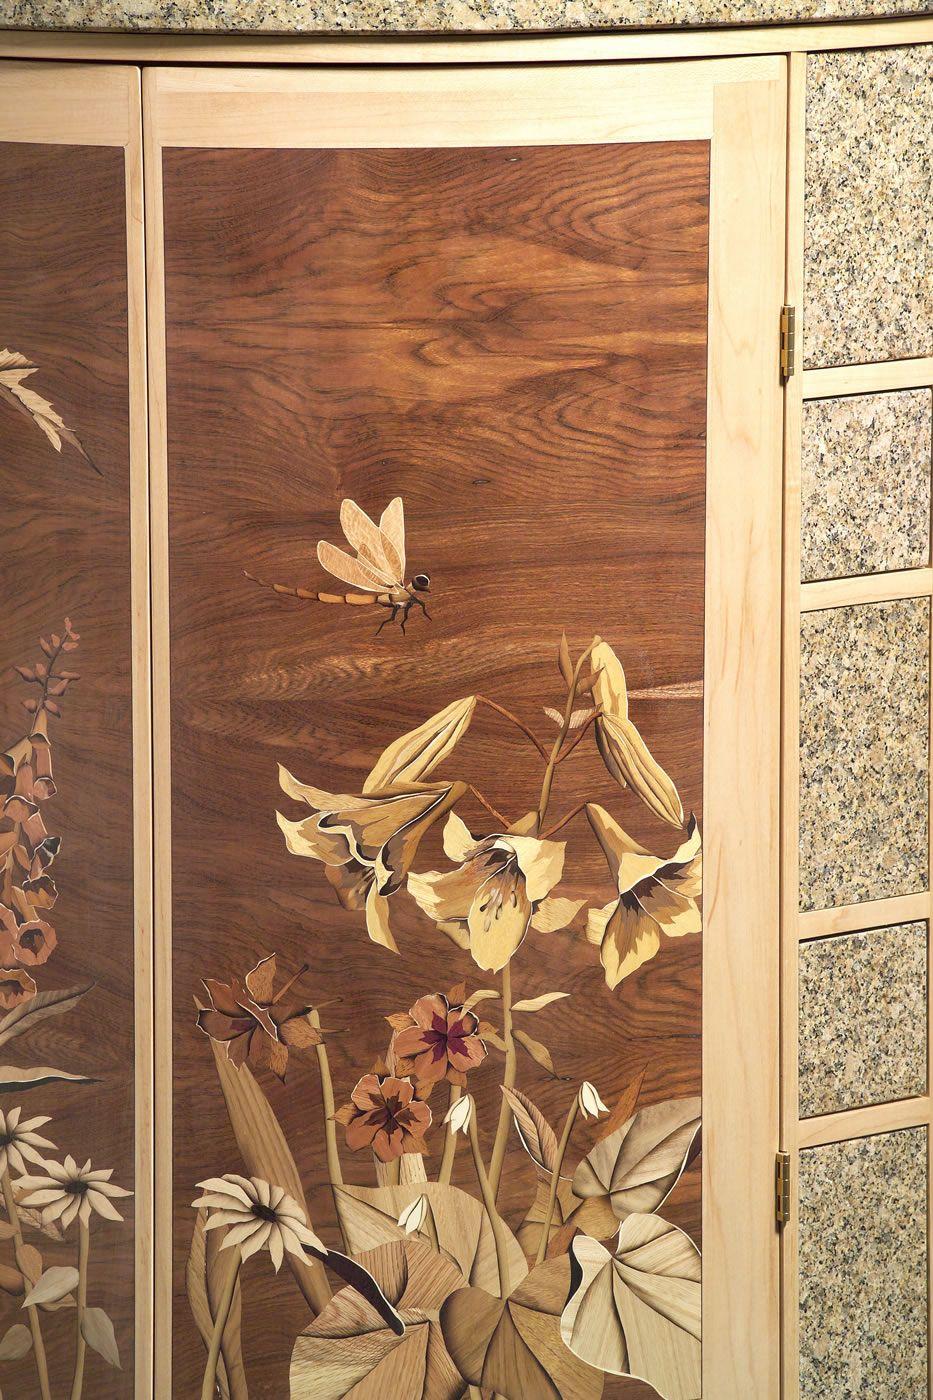 Details U2013 Silas Kopf Woodworking U2013 Inlaid Wood Marquetry Studio Furniture